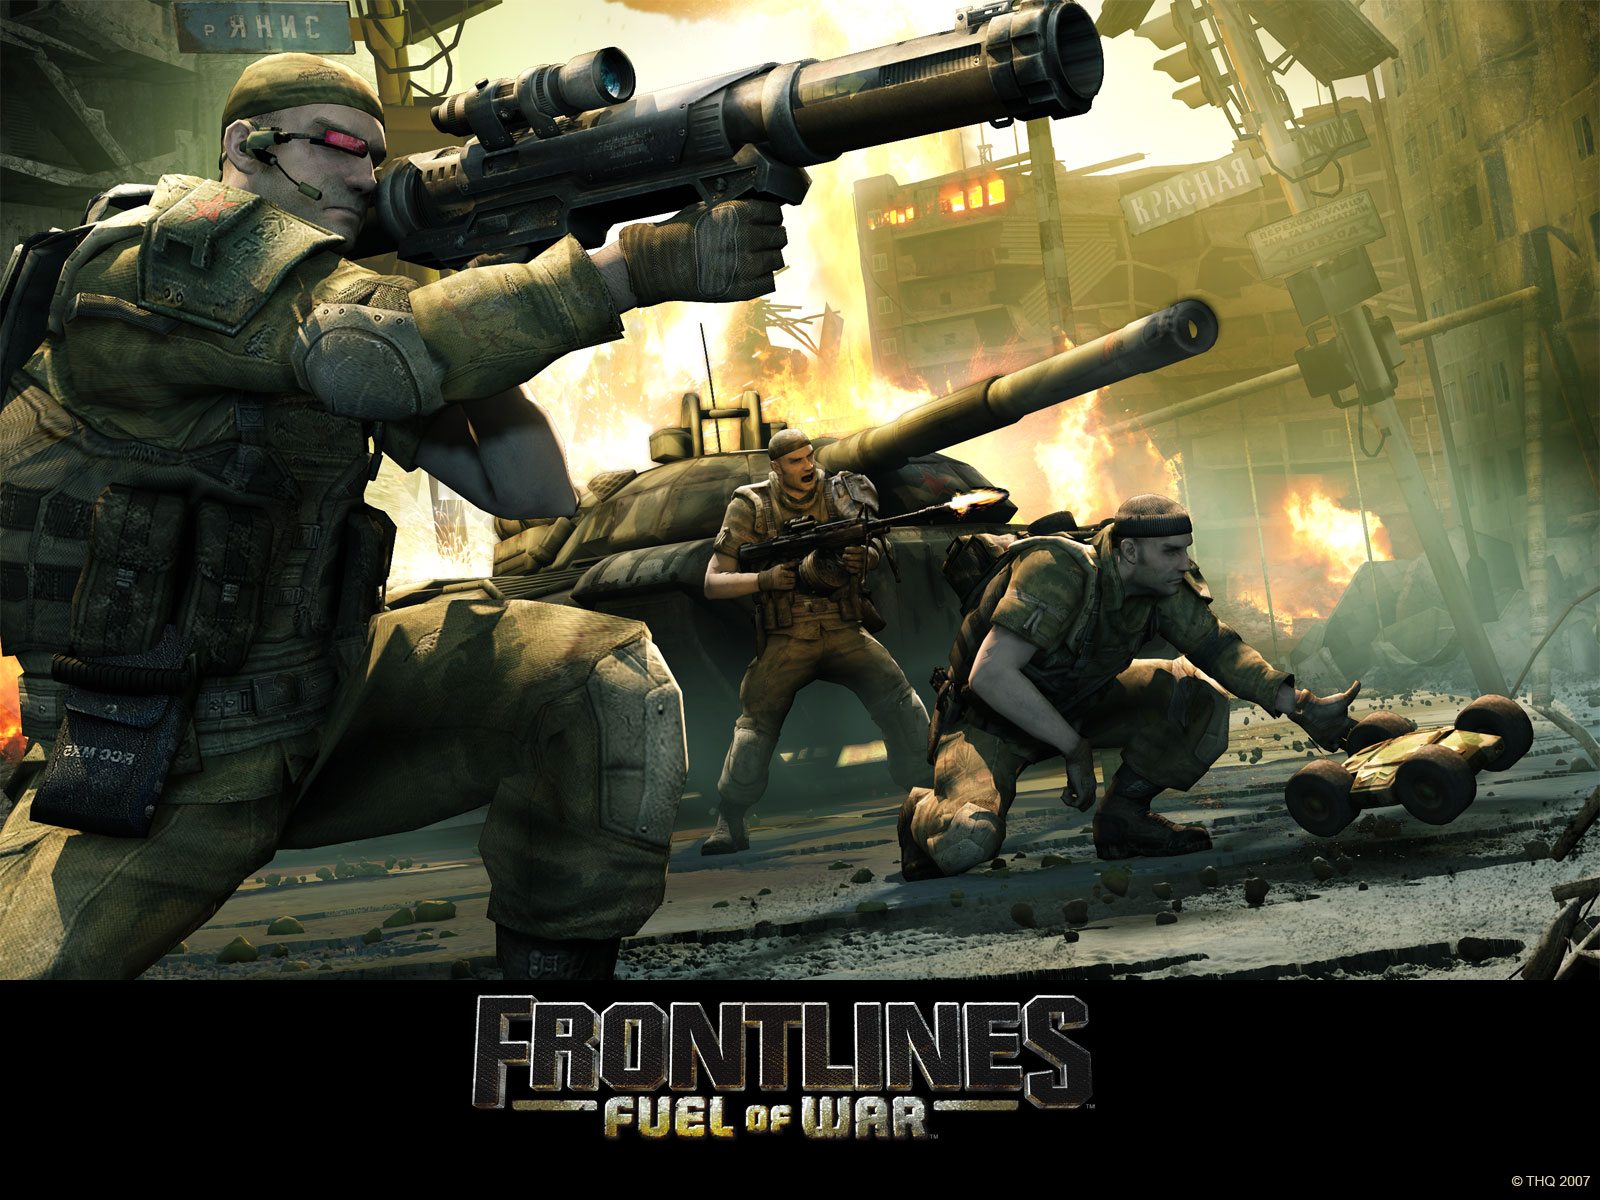 FRONLINES-FUEL OS WAR 16 JUNIO CQB GEDAT 1